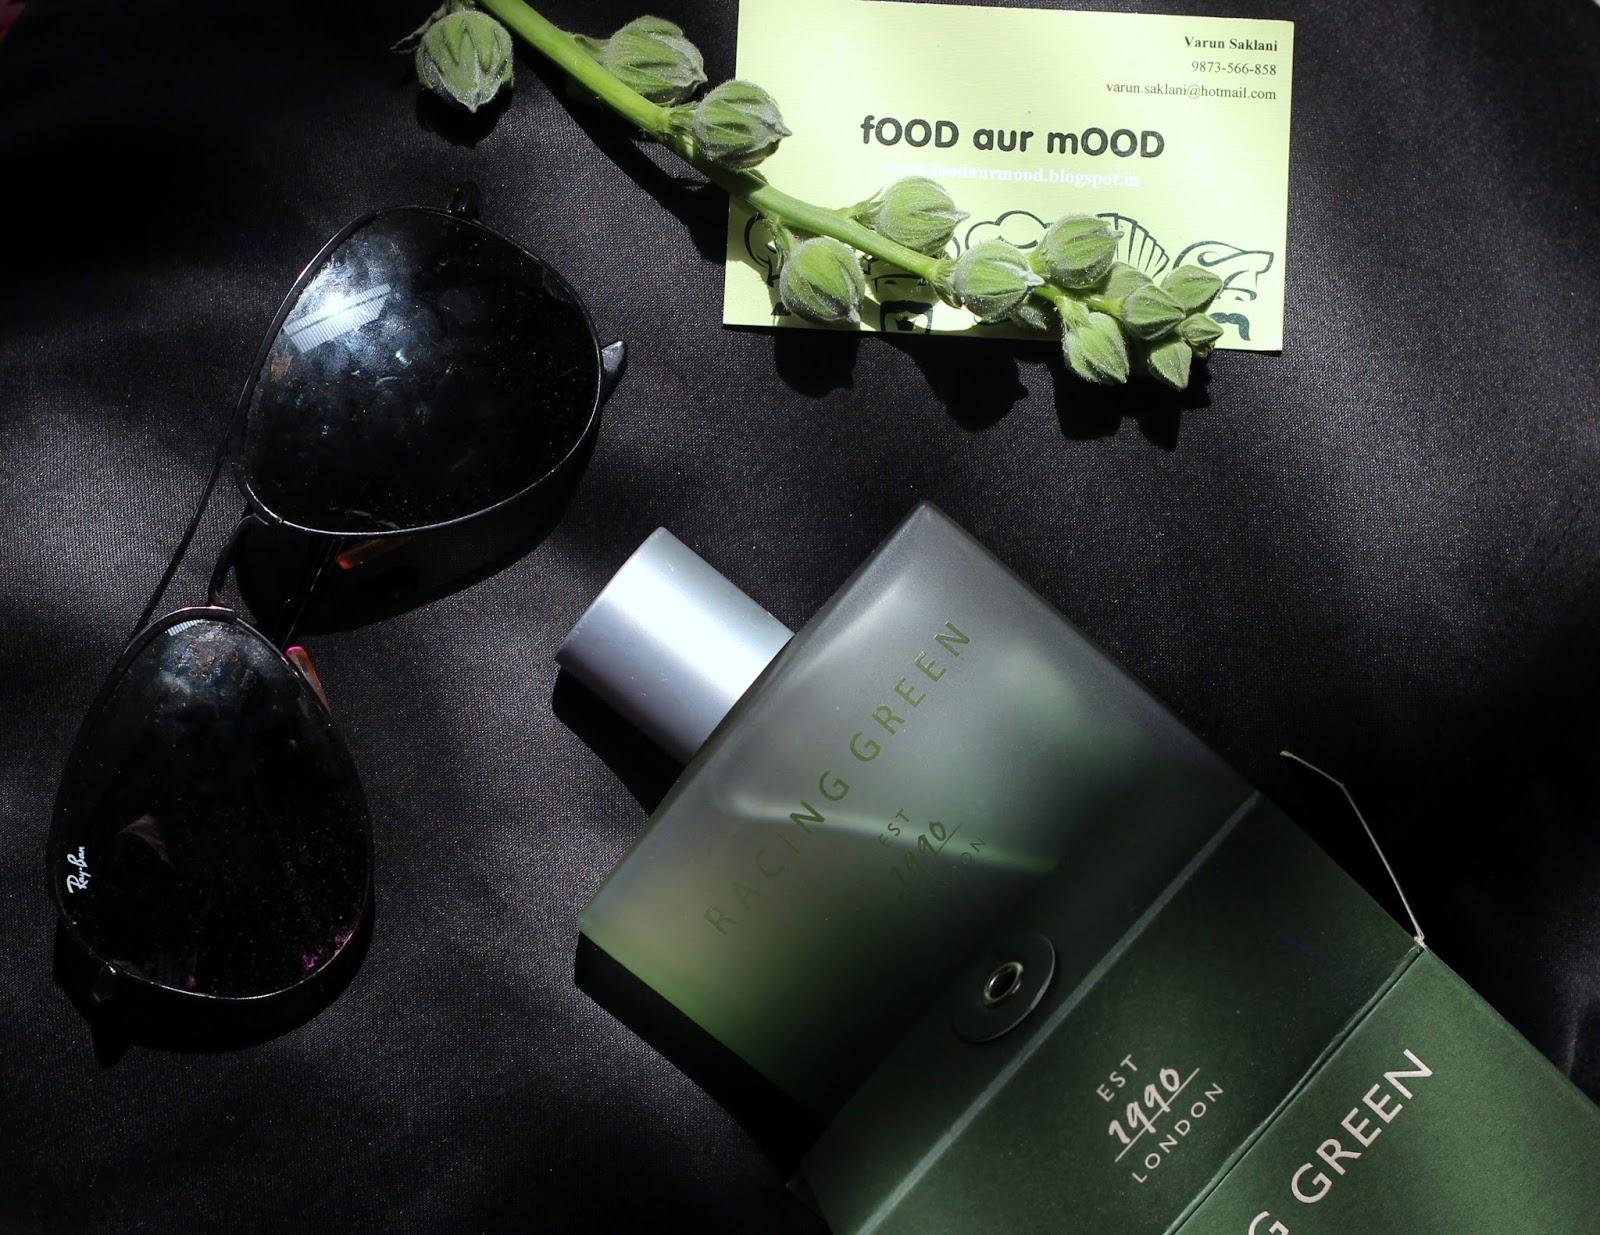 a3a797e0b204 Men's Eau De Parfum - Laurelle London Racing Green Review - Shopping ...